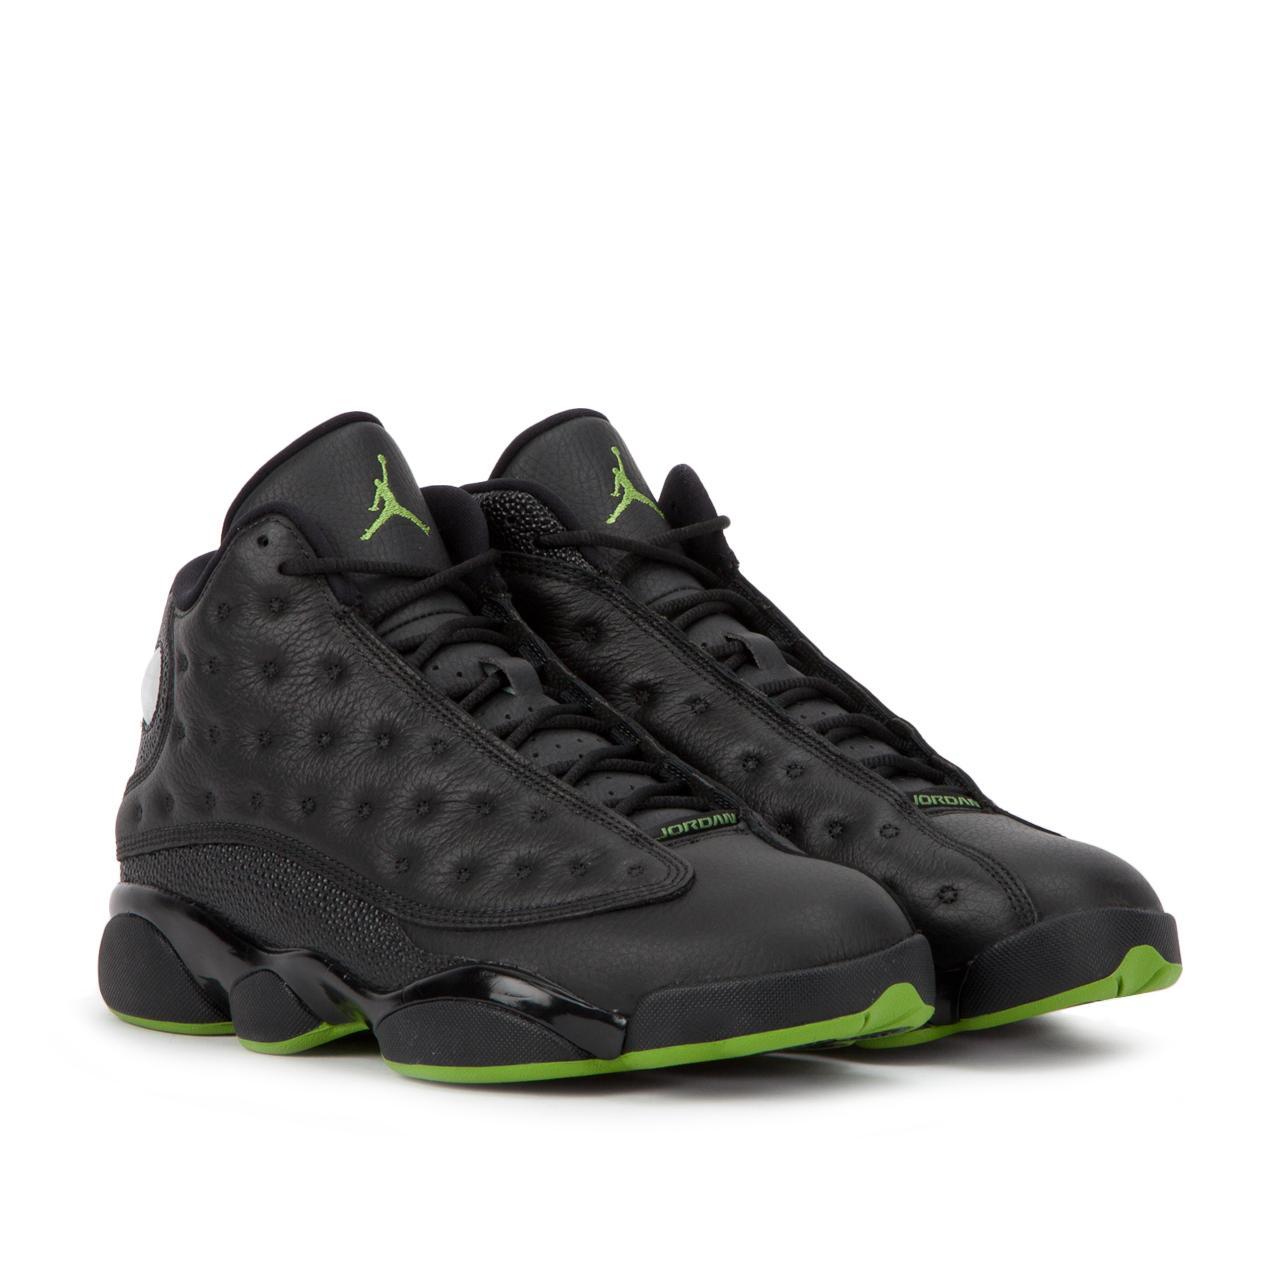 cc004ff514e071 Lyst - Nike Nike Air Jordan Xiii Retro